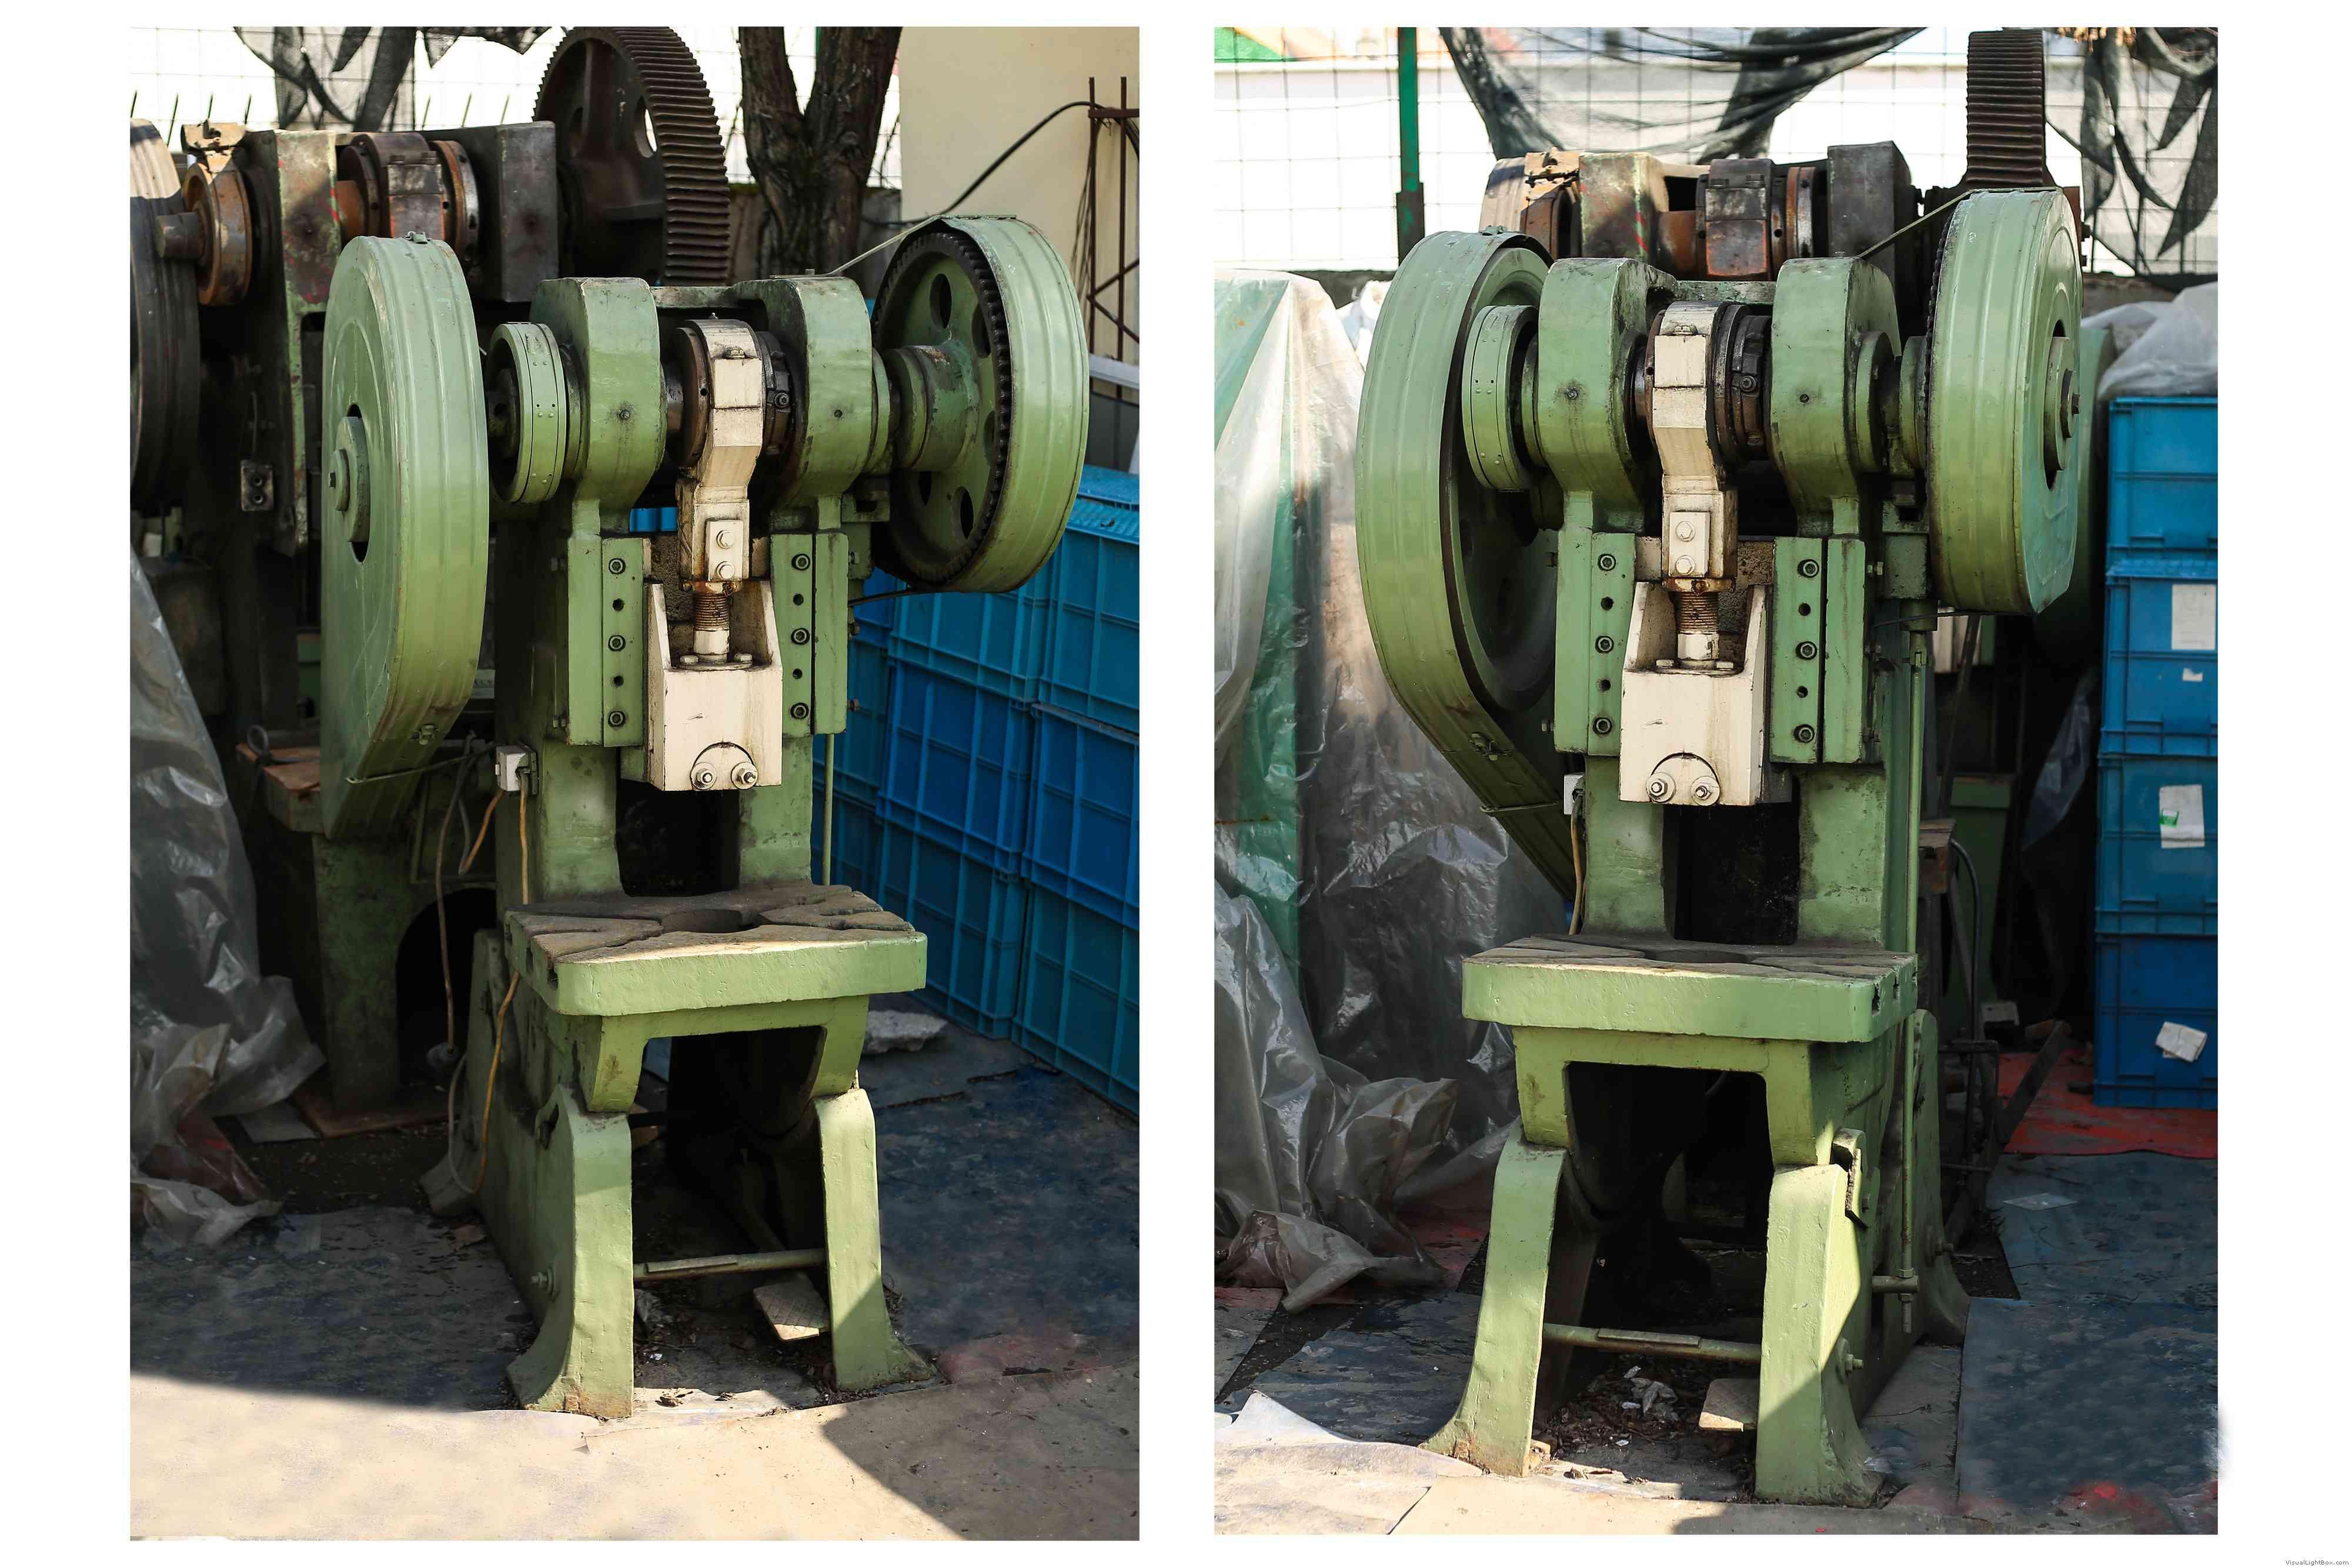 Sanayi Makineleri